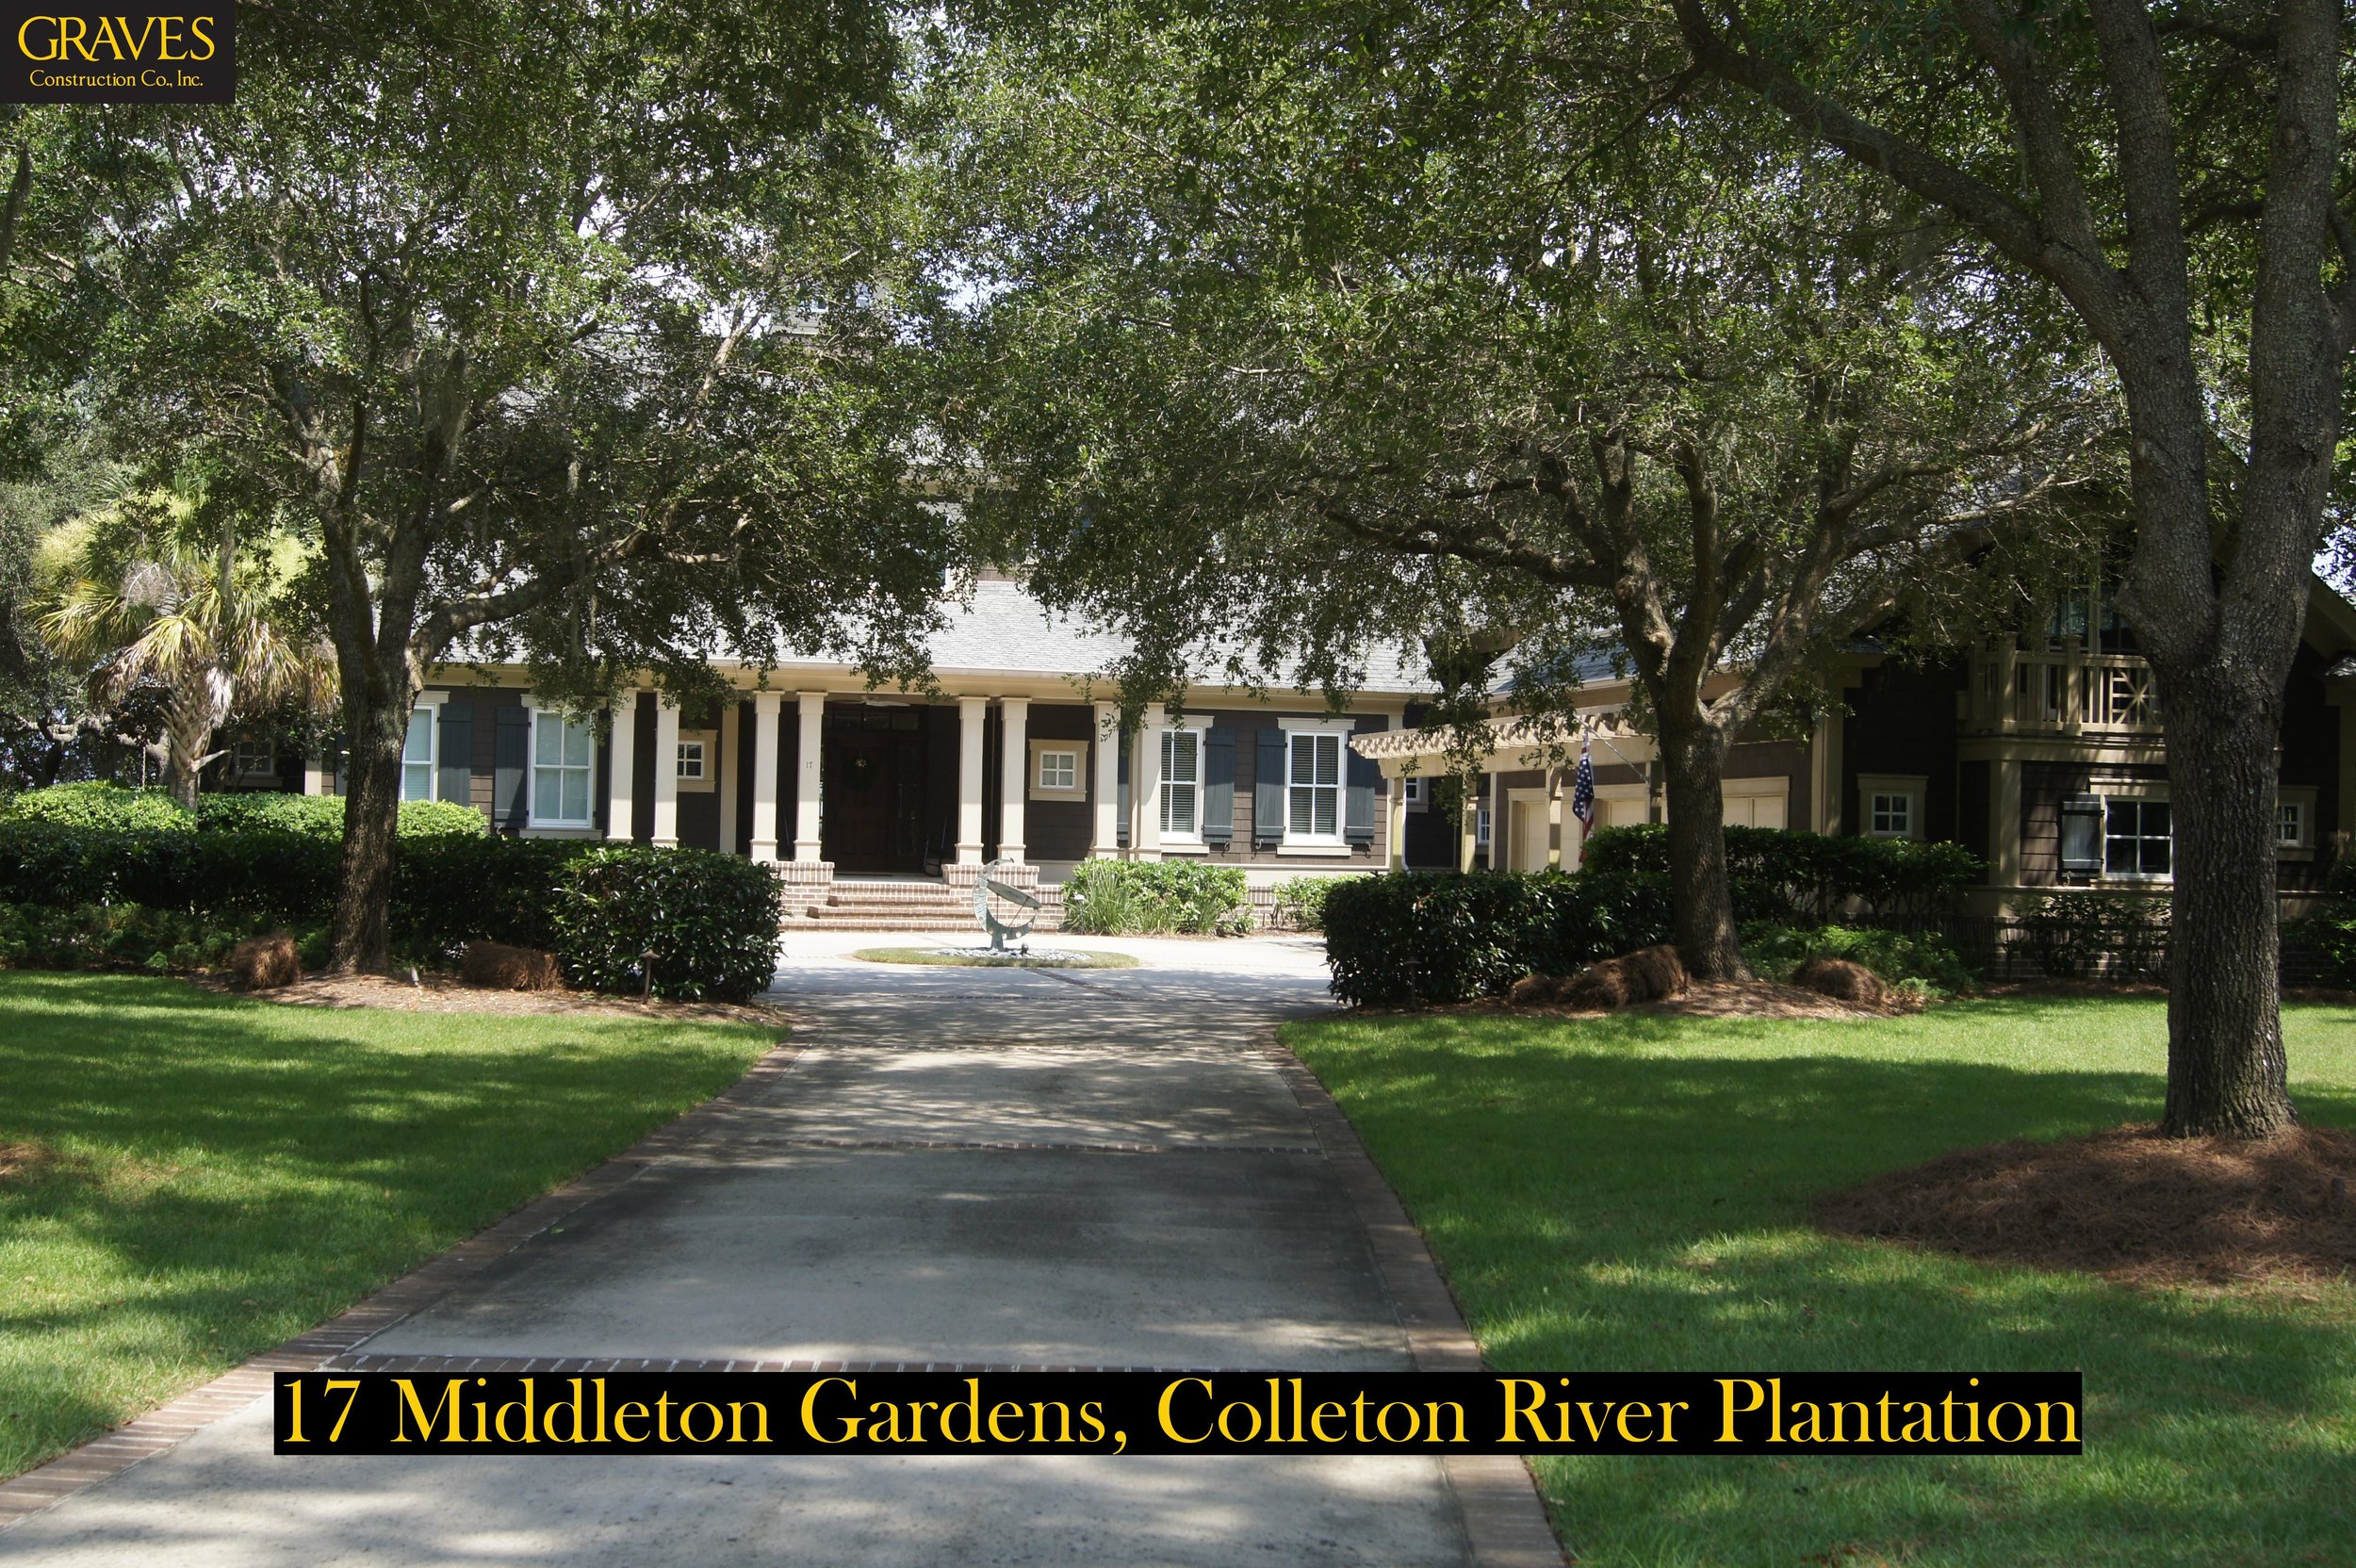 17 Middleton Gardens - 5